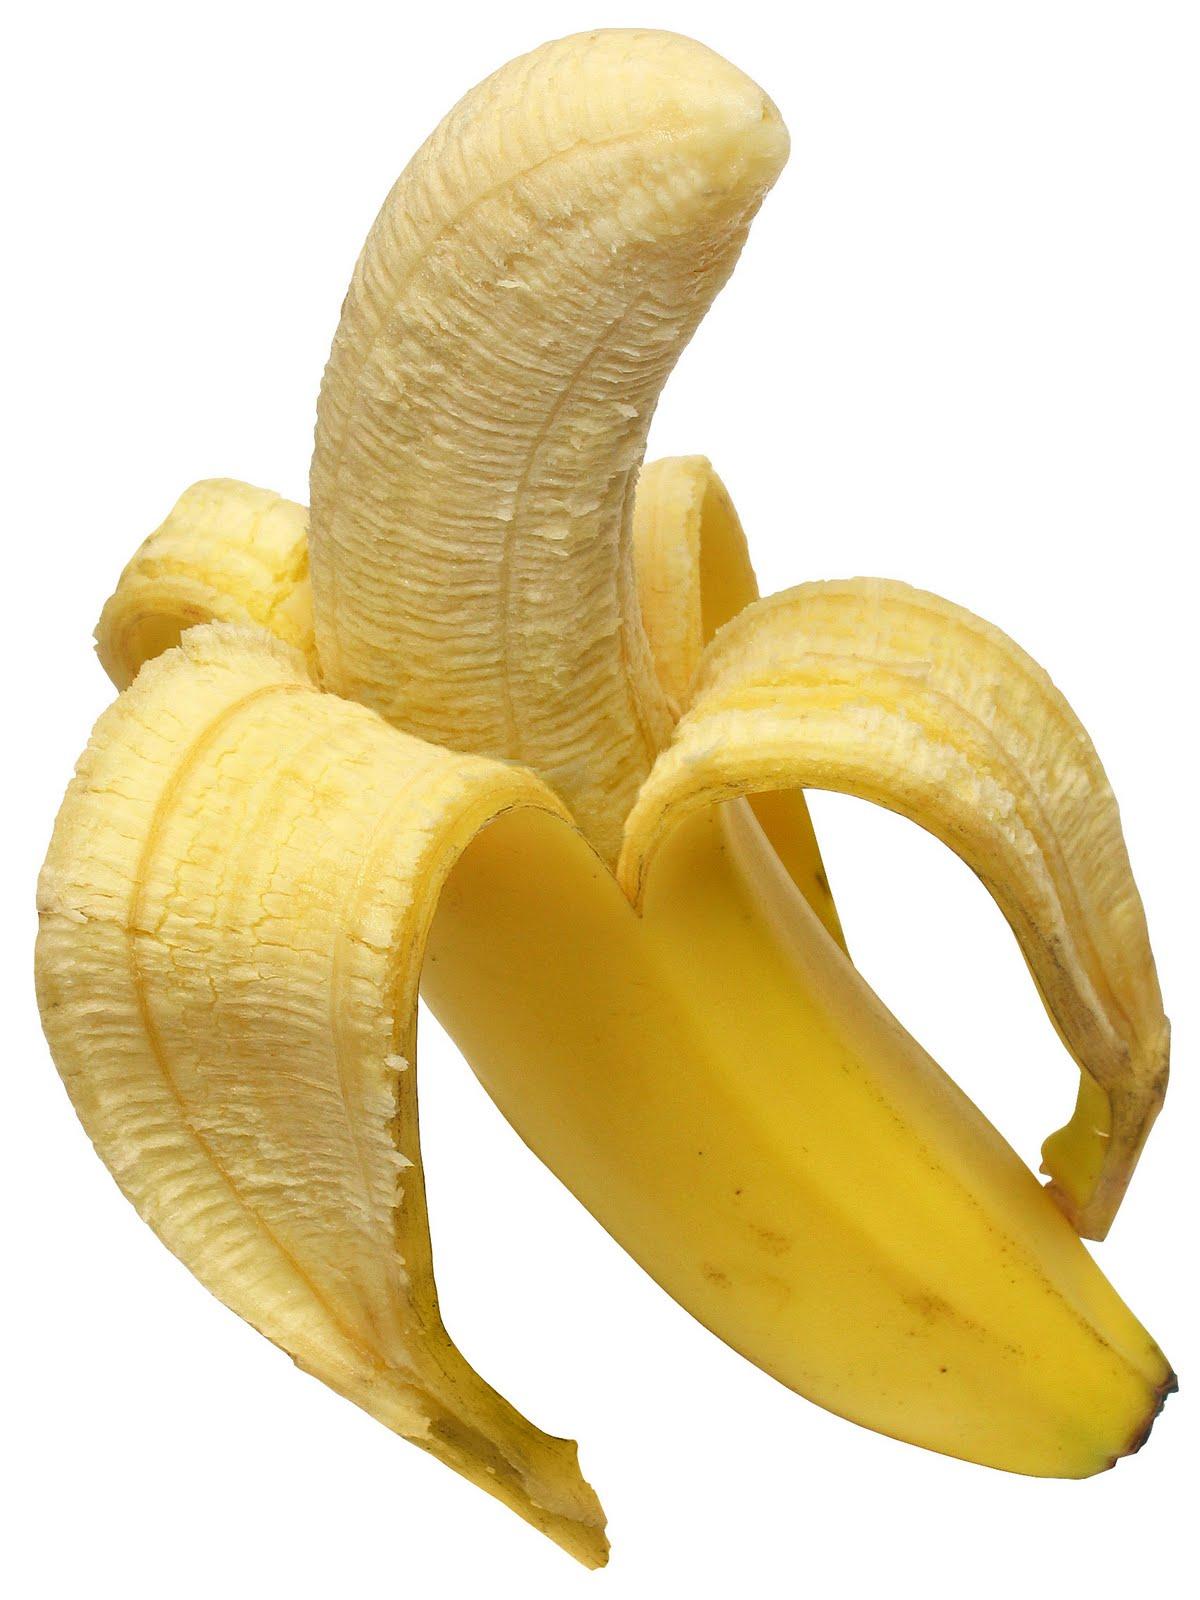 adreamatico.com_data_images_banana_banana_2.jpg